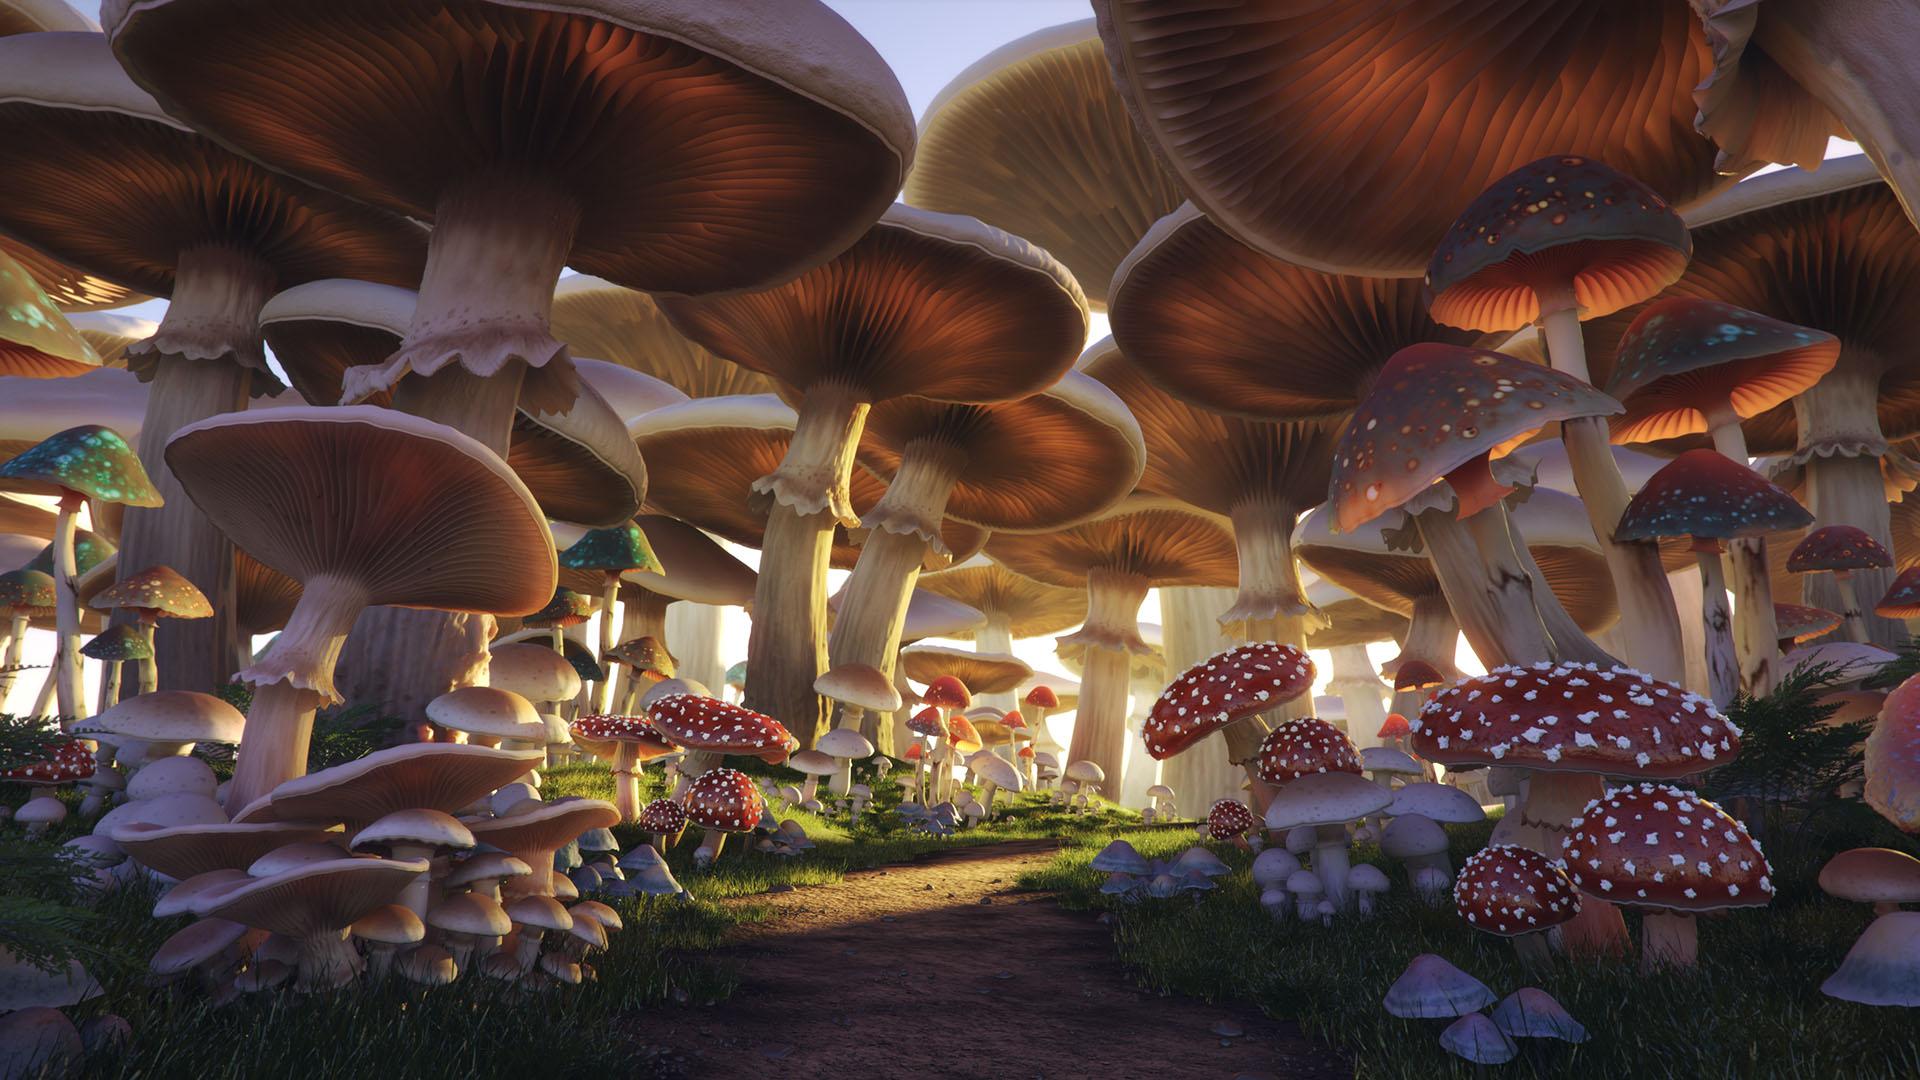 3d Animated Nature Wallpaper For Mobile Mushroom Forest Andrei Serghiuta Freelance 3d